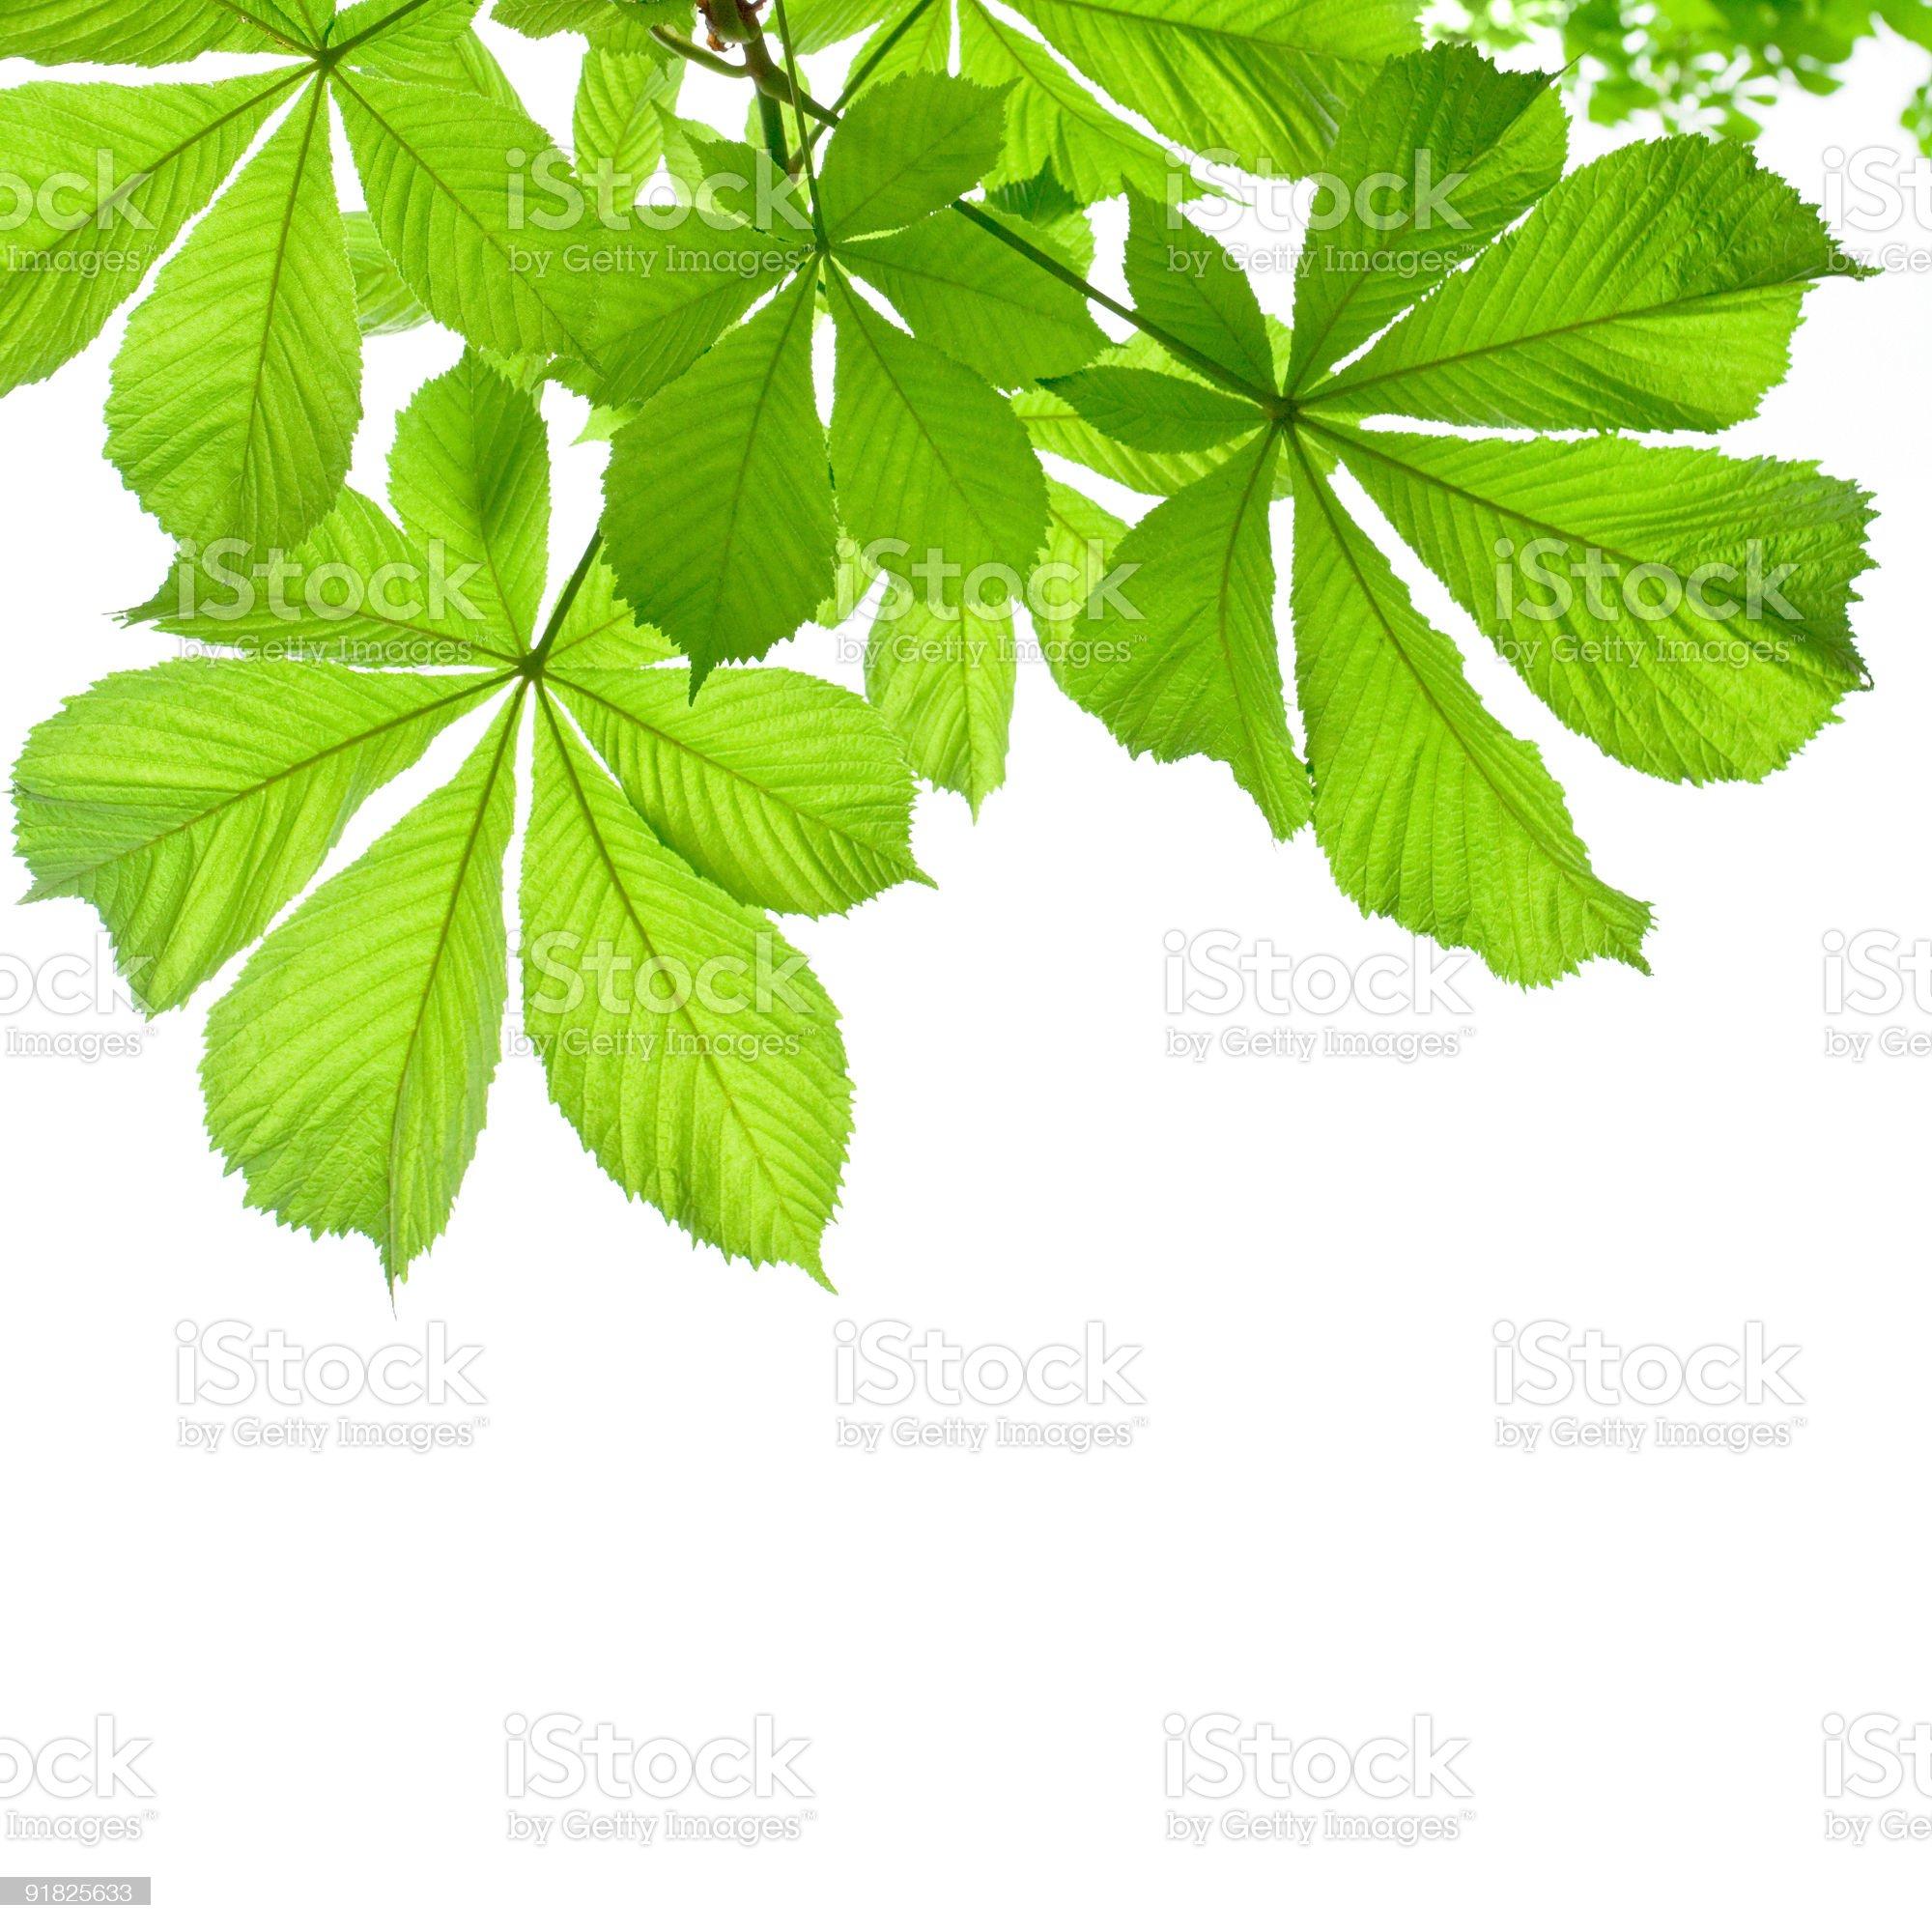 Chestnut leaves on white background royalty-free stock photo